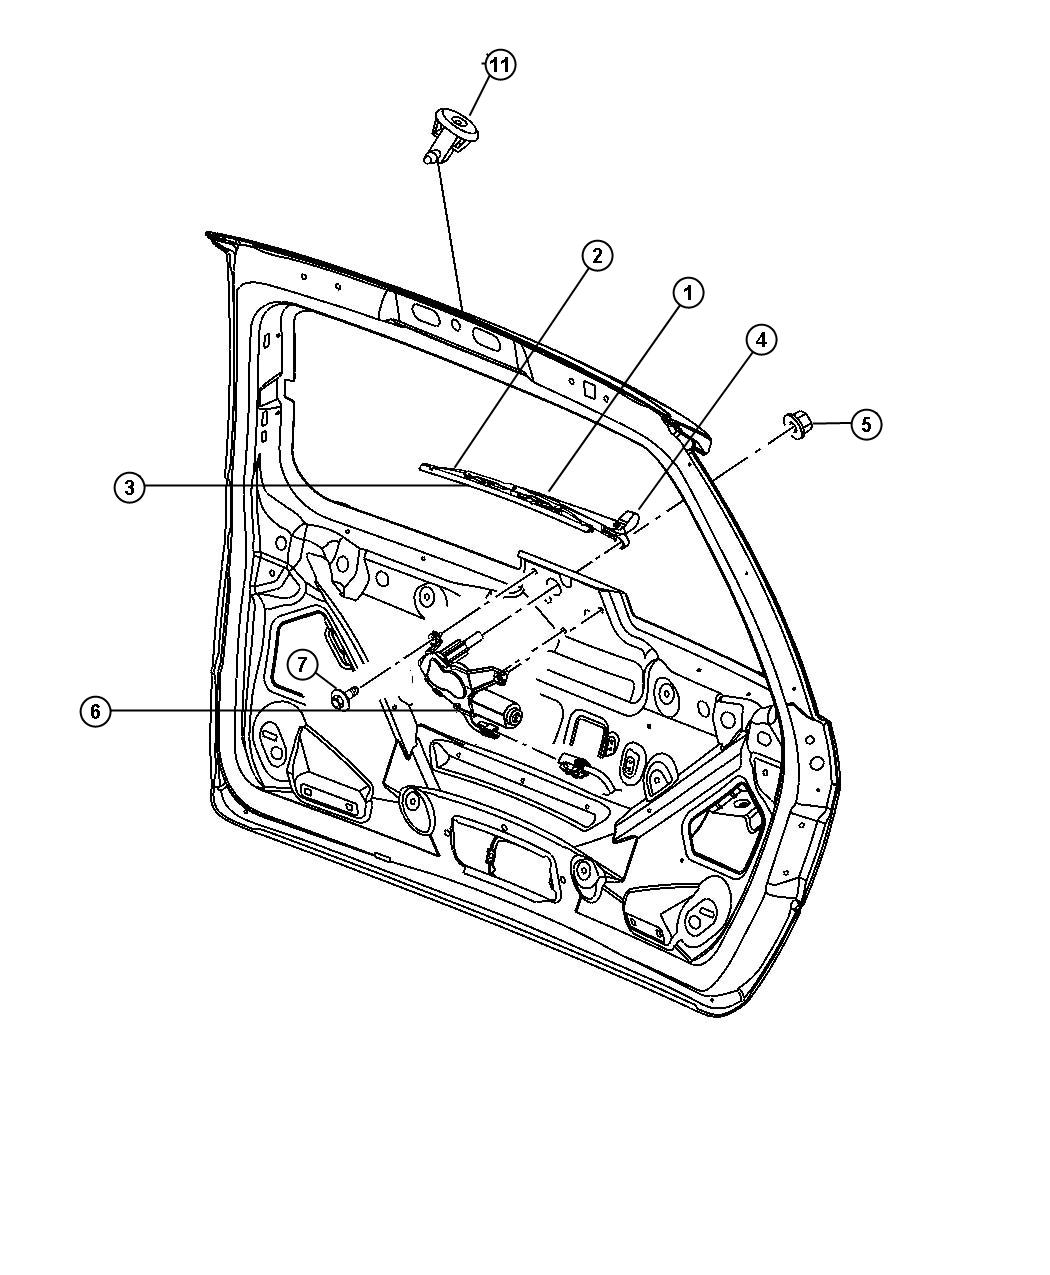 Chrysler Pacifica Arm. Liftgate wiper, rear wiper